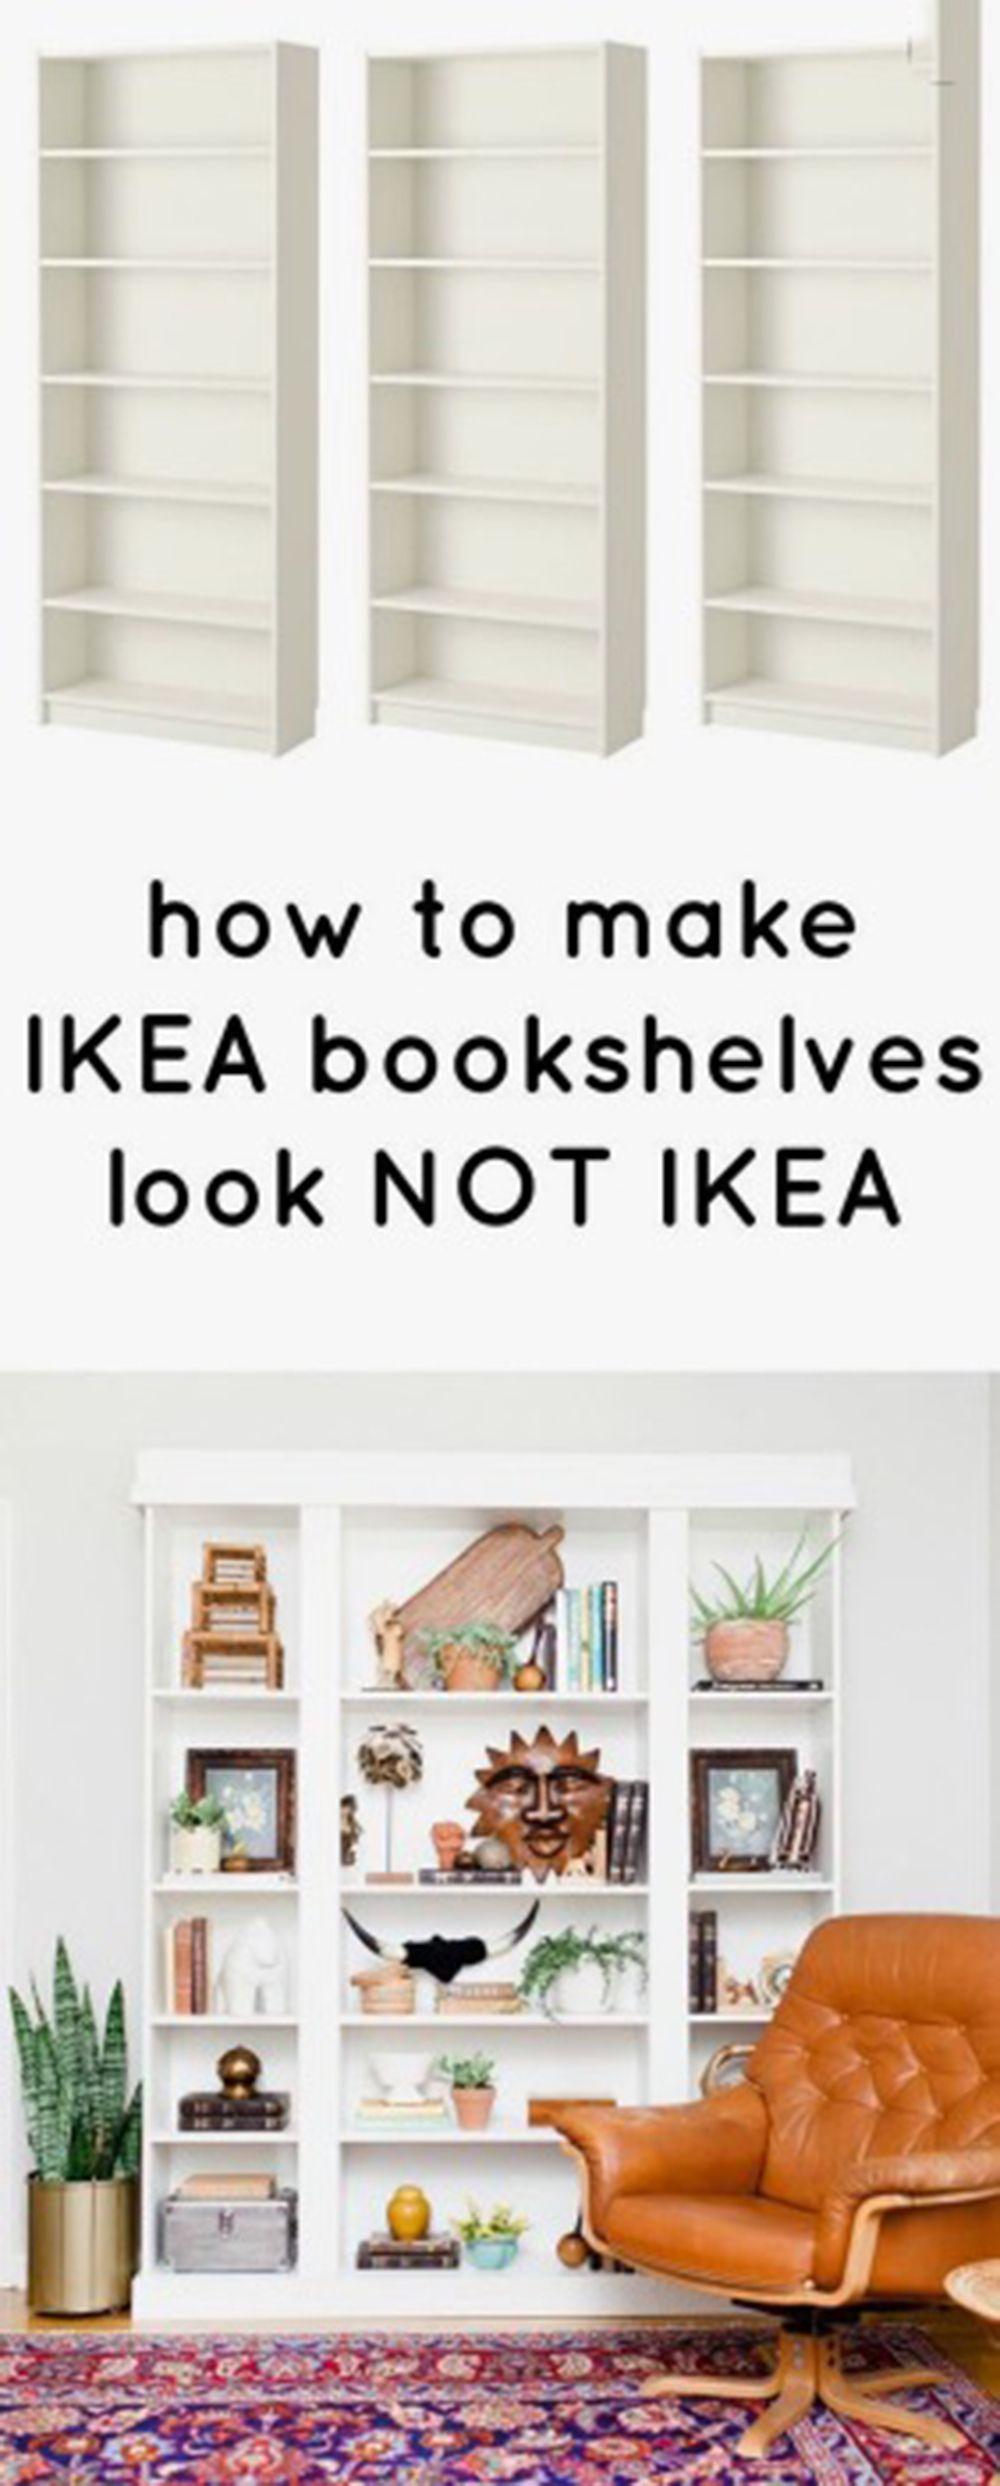 12 genius hacks to transform your IKEA BILLY bookcase